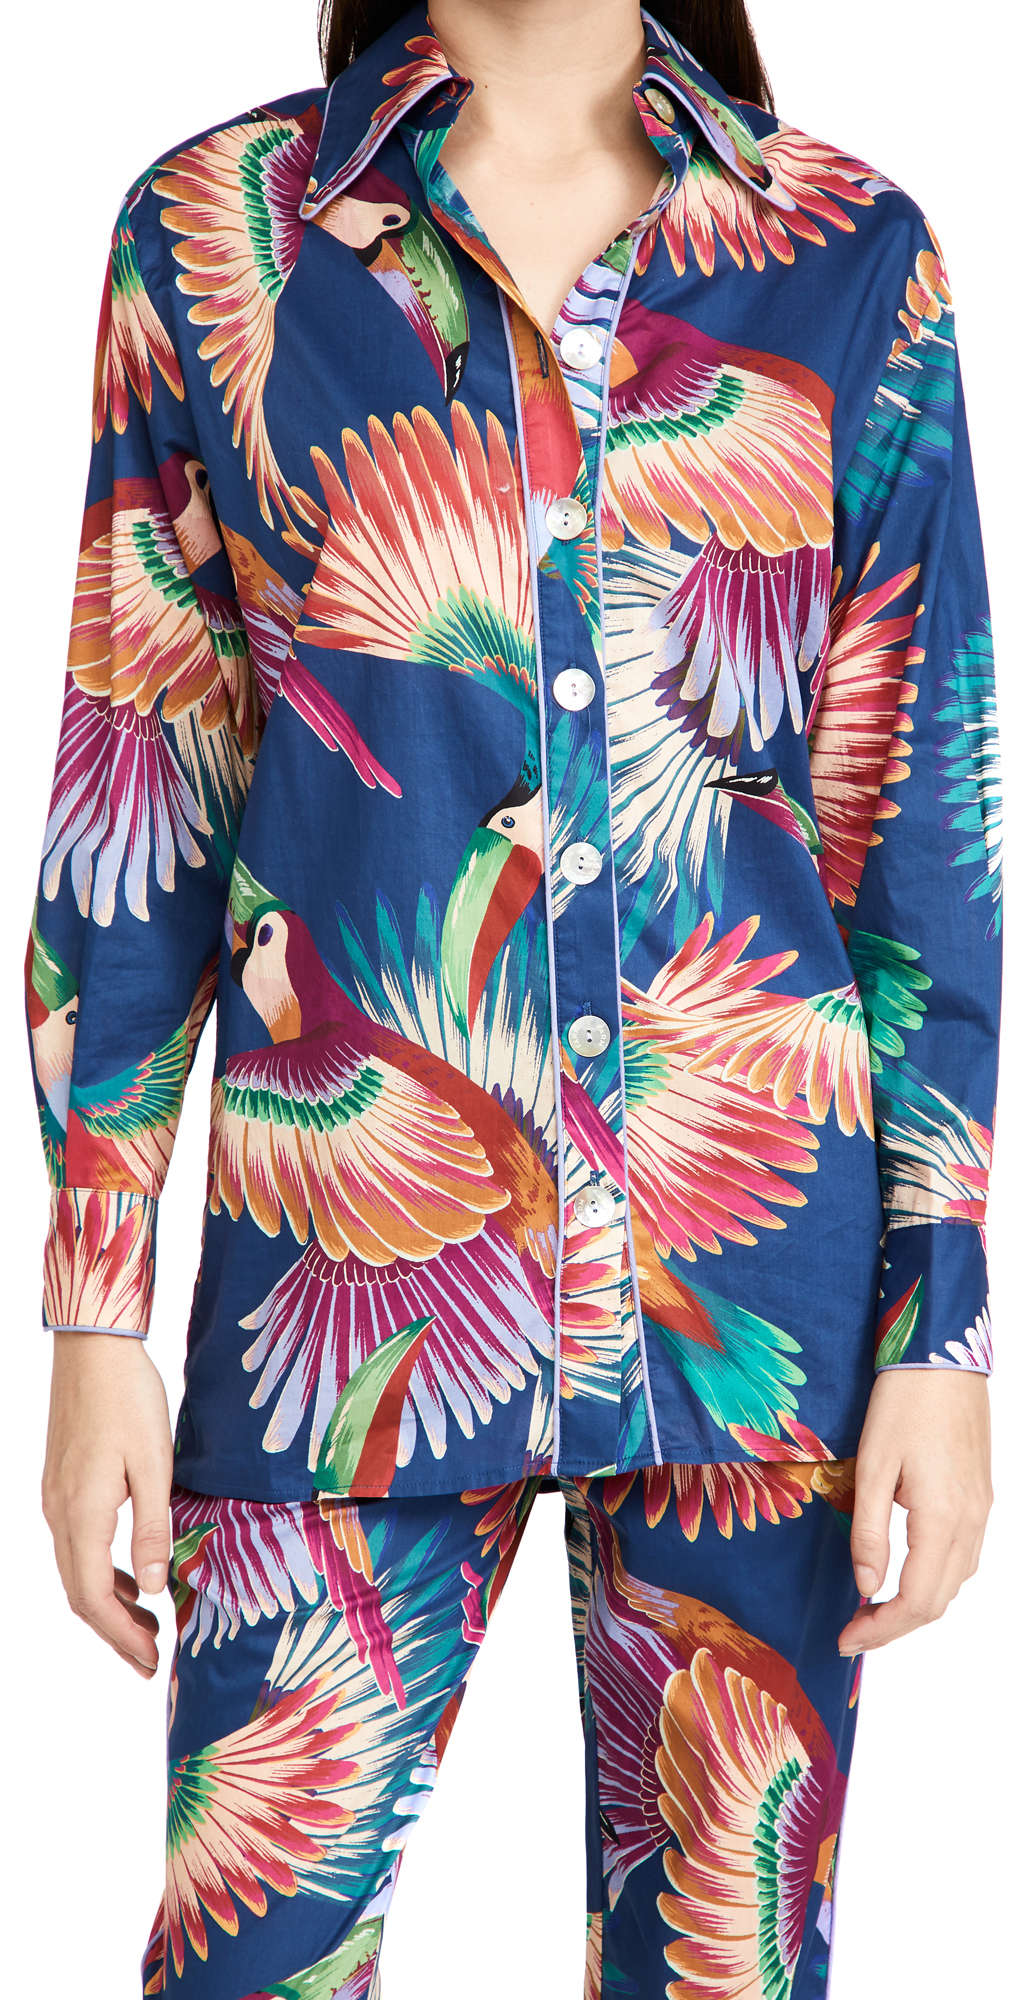 FARM Rio Colorful Toucans Pajama Shirt